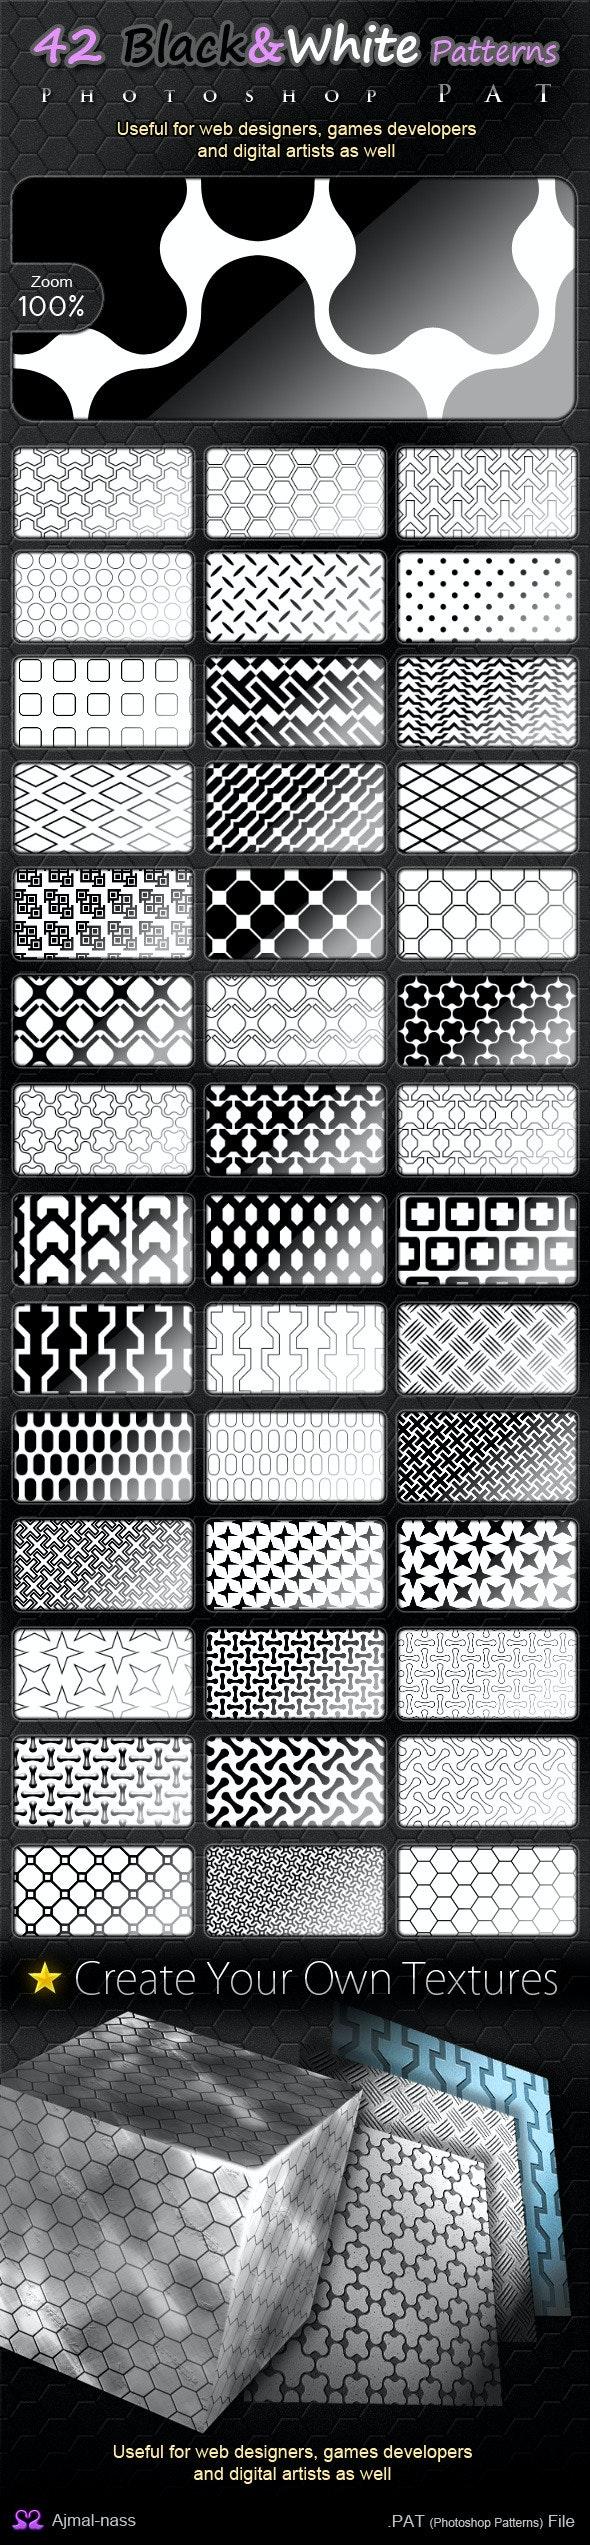 42 Black&White Patterns - Textures / Fills / Patterns Photoshop